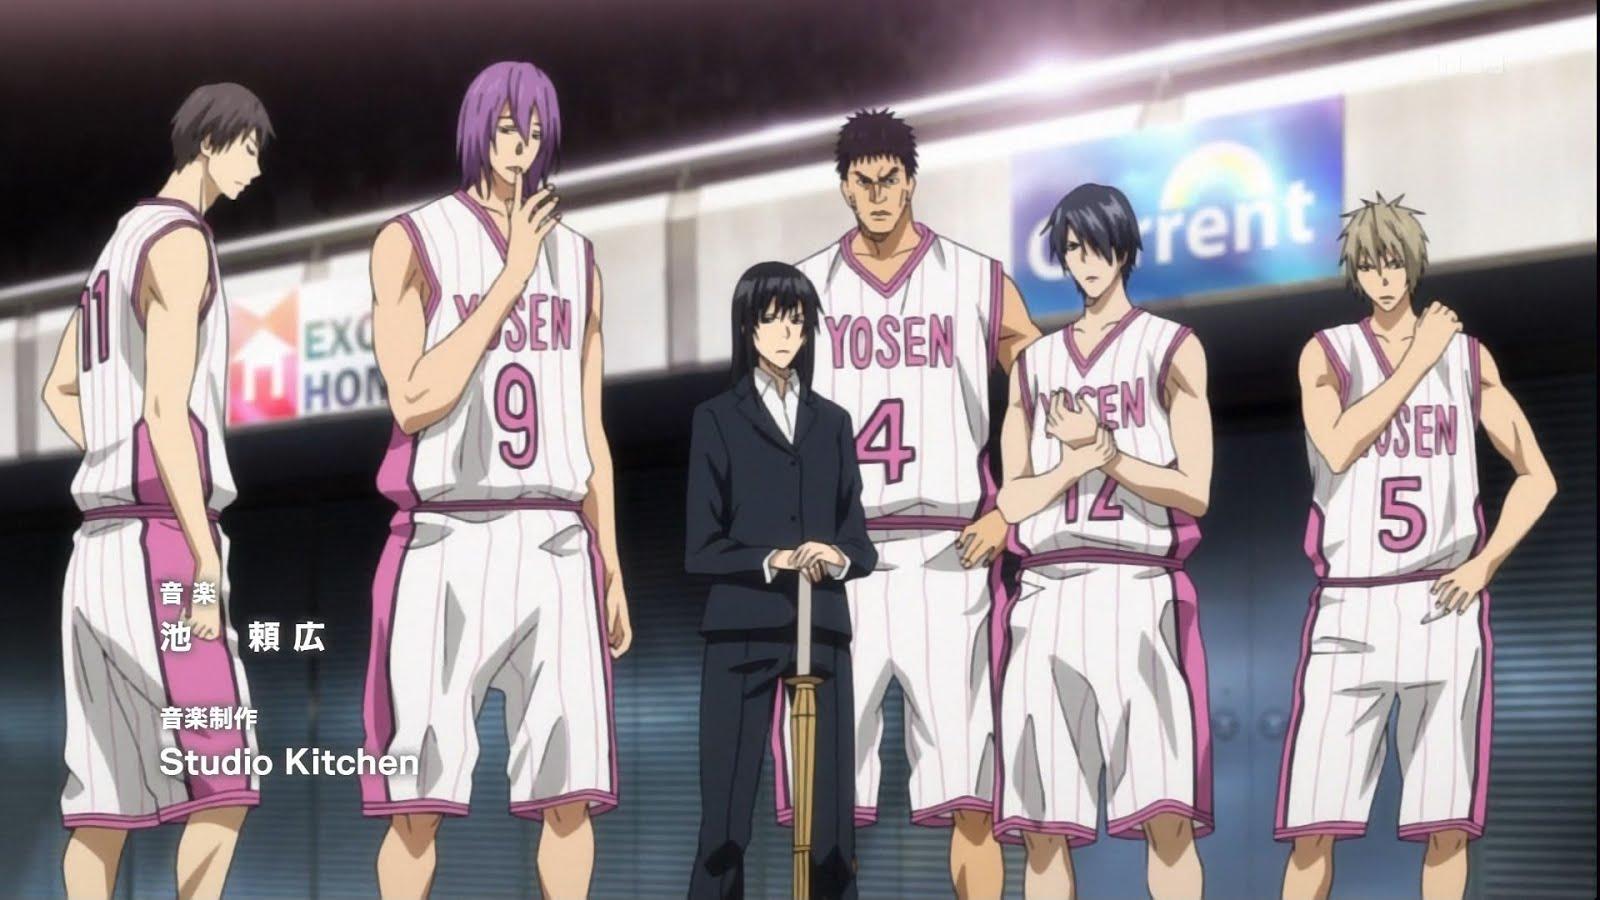 Kuroko no Basuke Characters Jersey Numbers【Seichi junrei